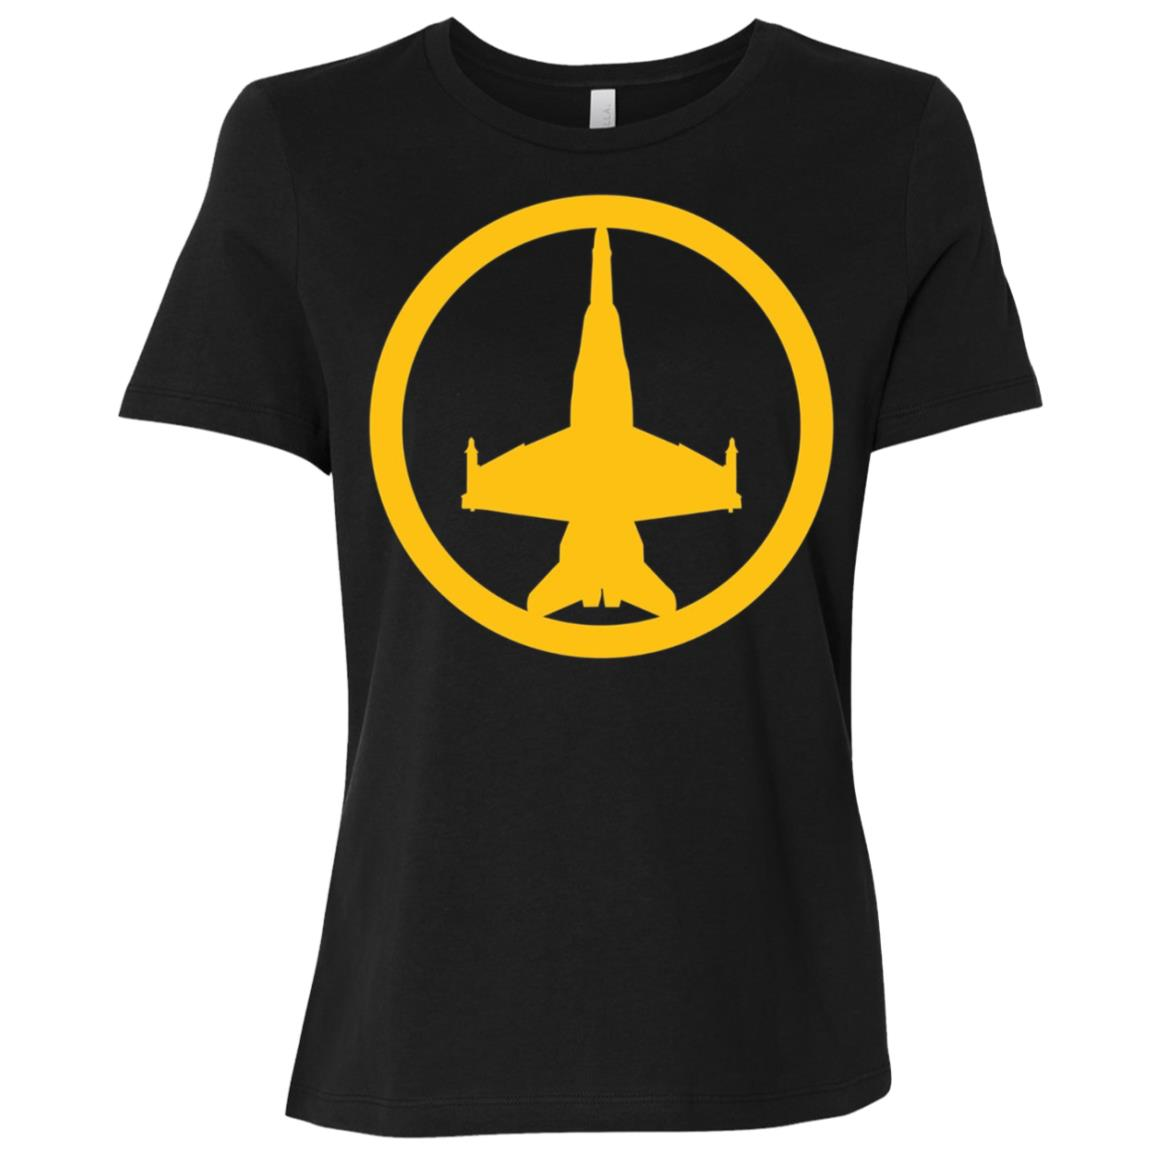 FA-18 Super Hornet (Yellow) USAF Air Supremacy Jet Women Short Sleeve T-Shirt